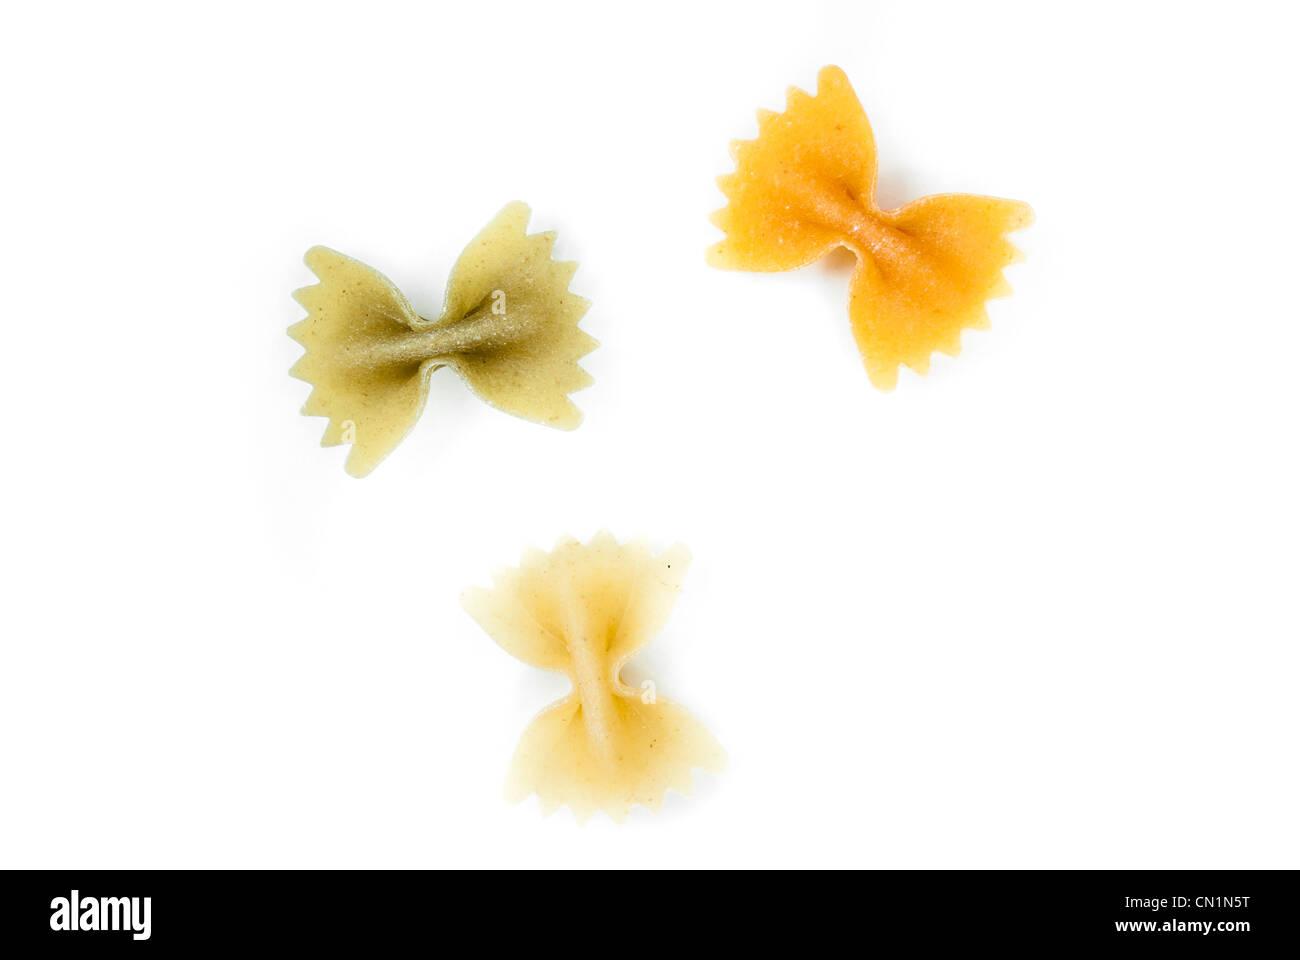 Farfalle pasta on a white background - Stock Image